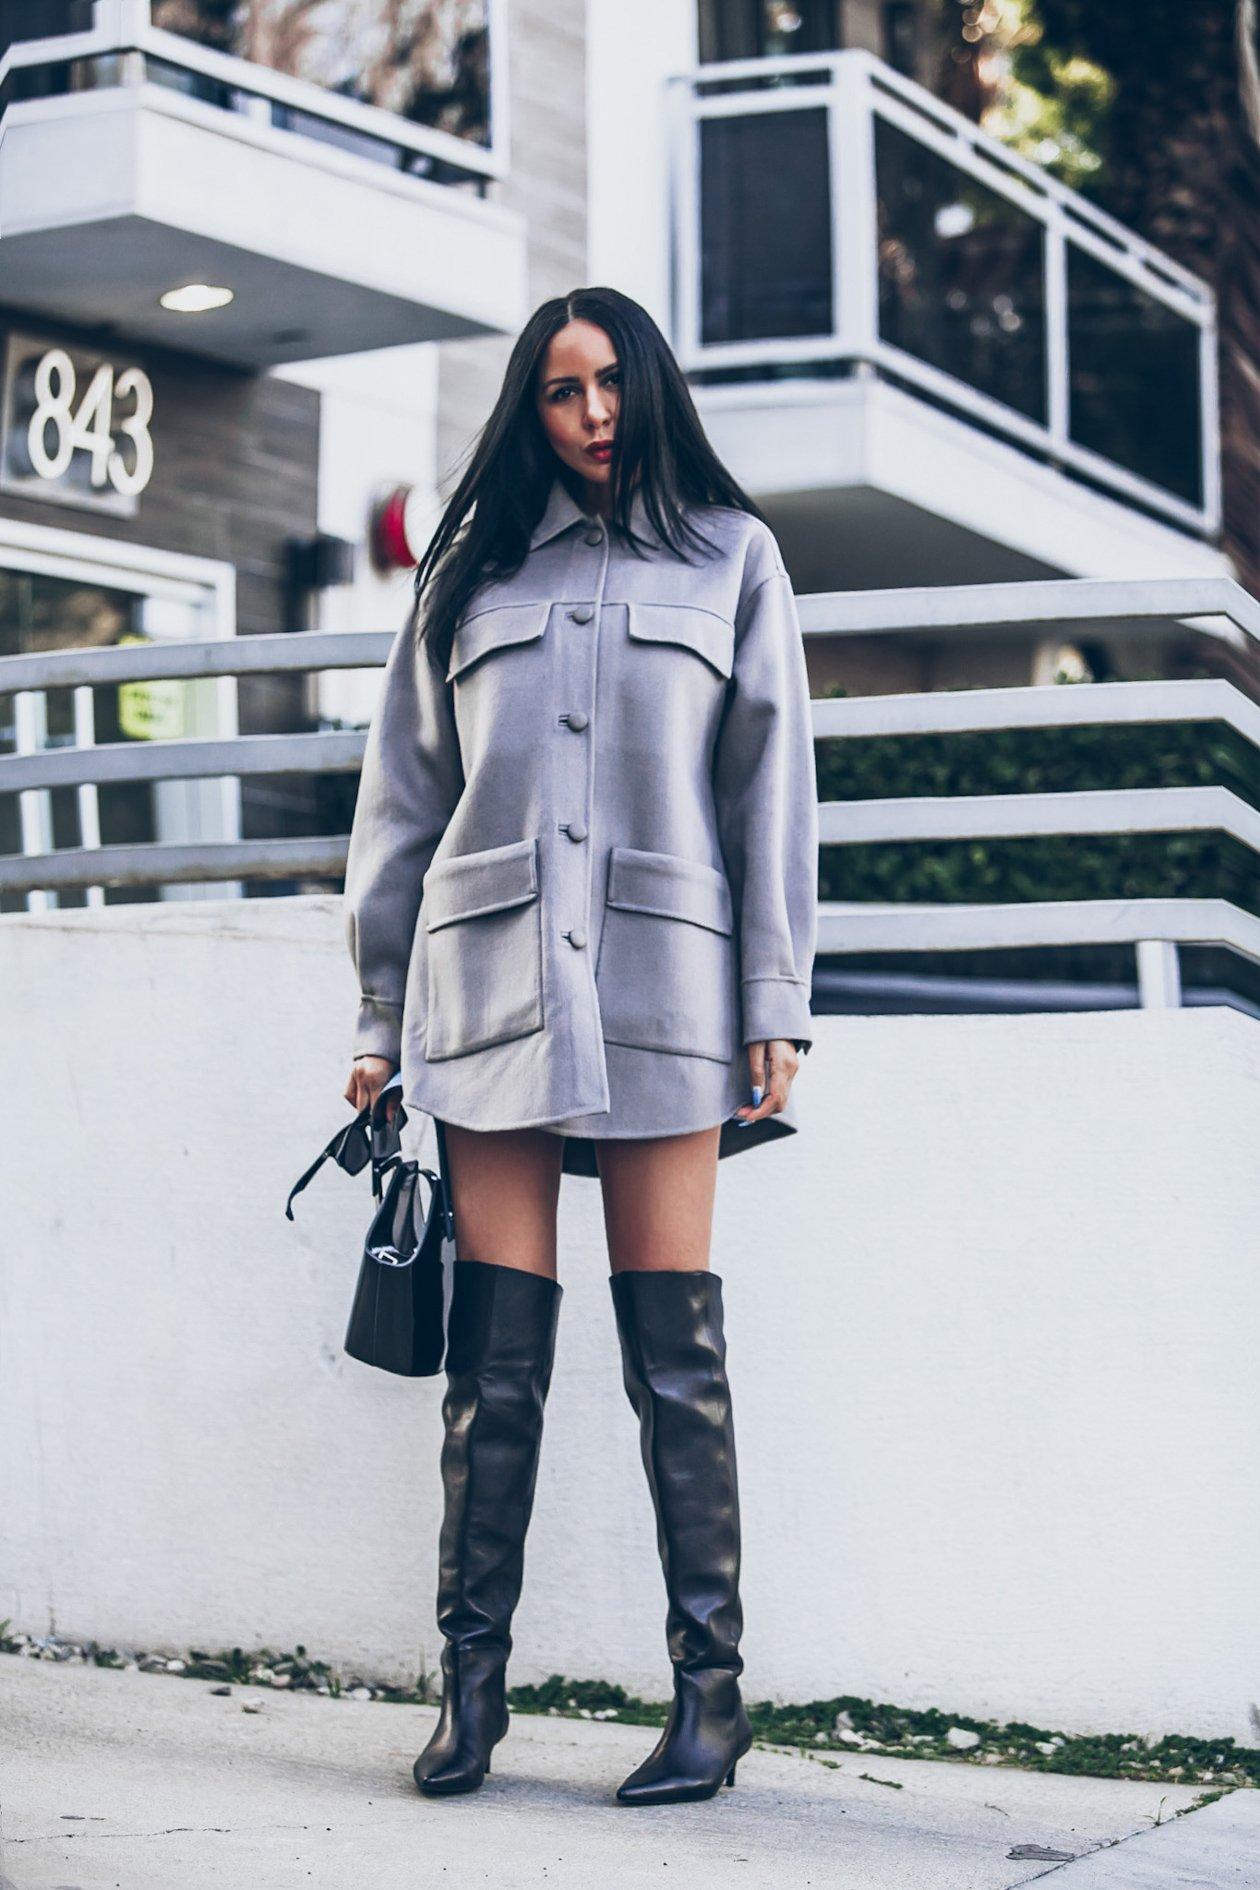 jacket or dress